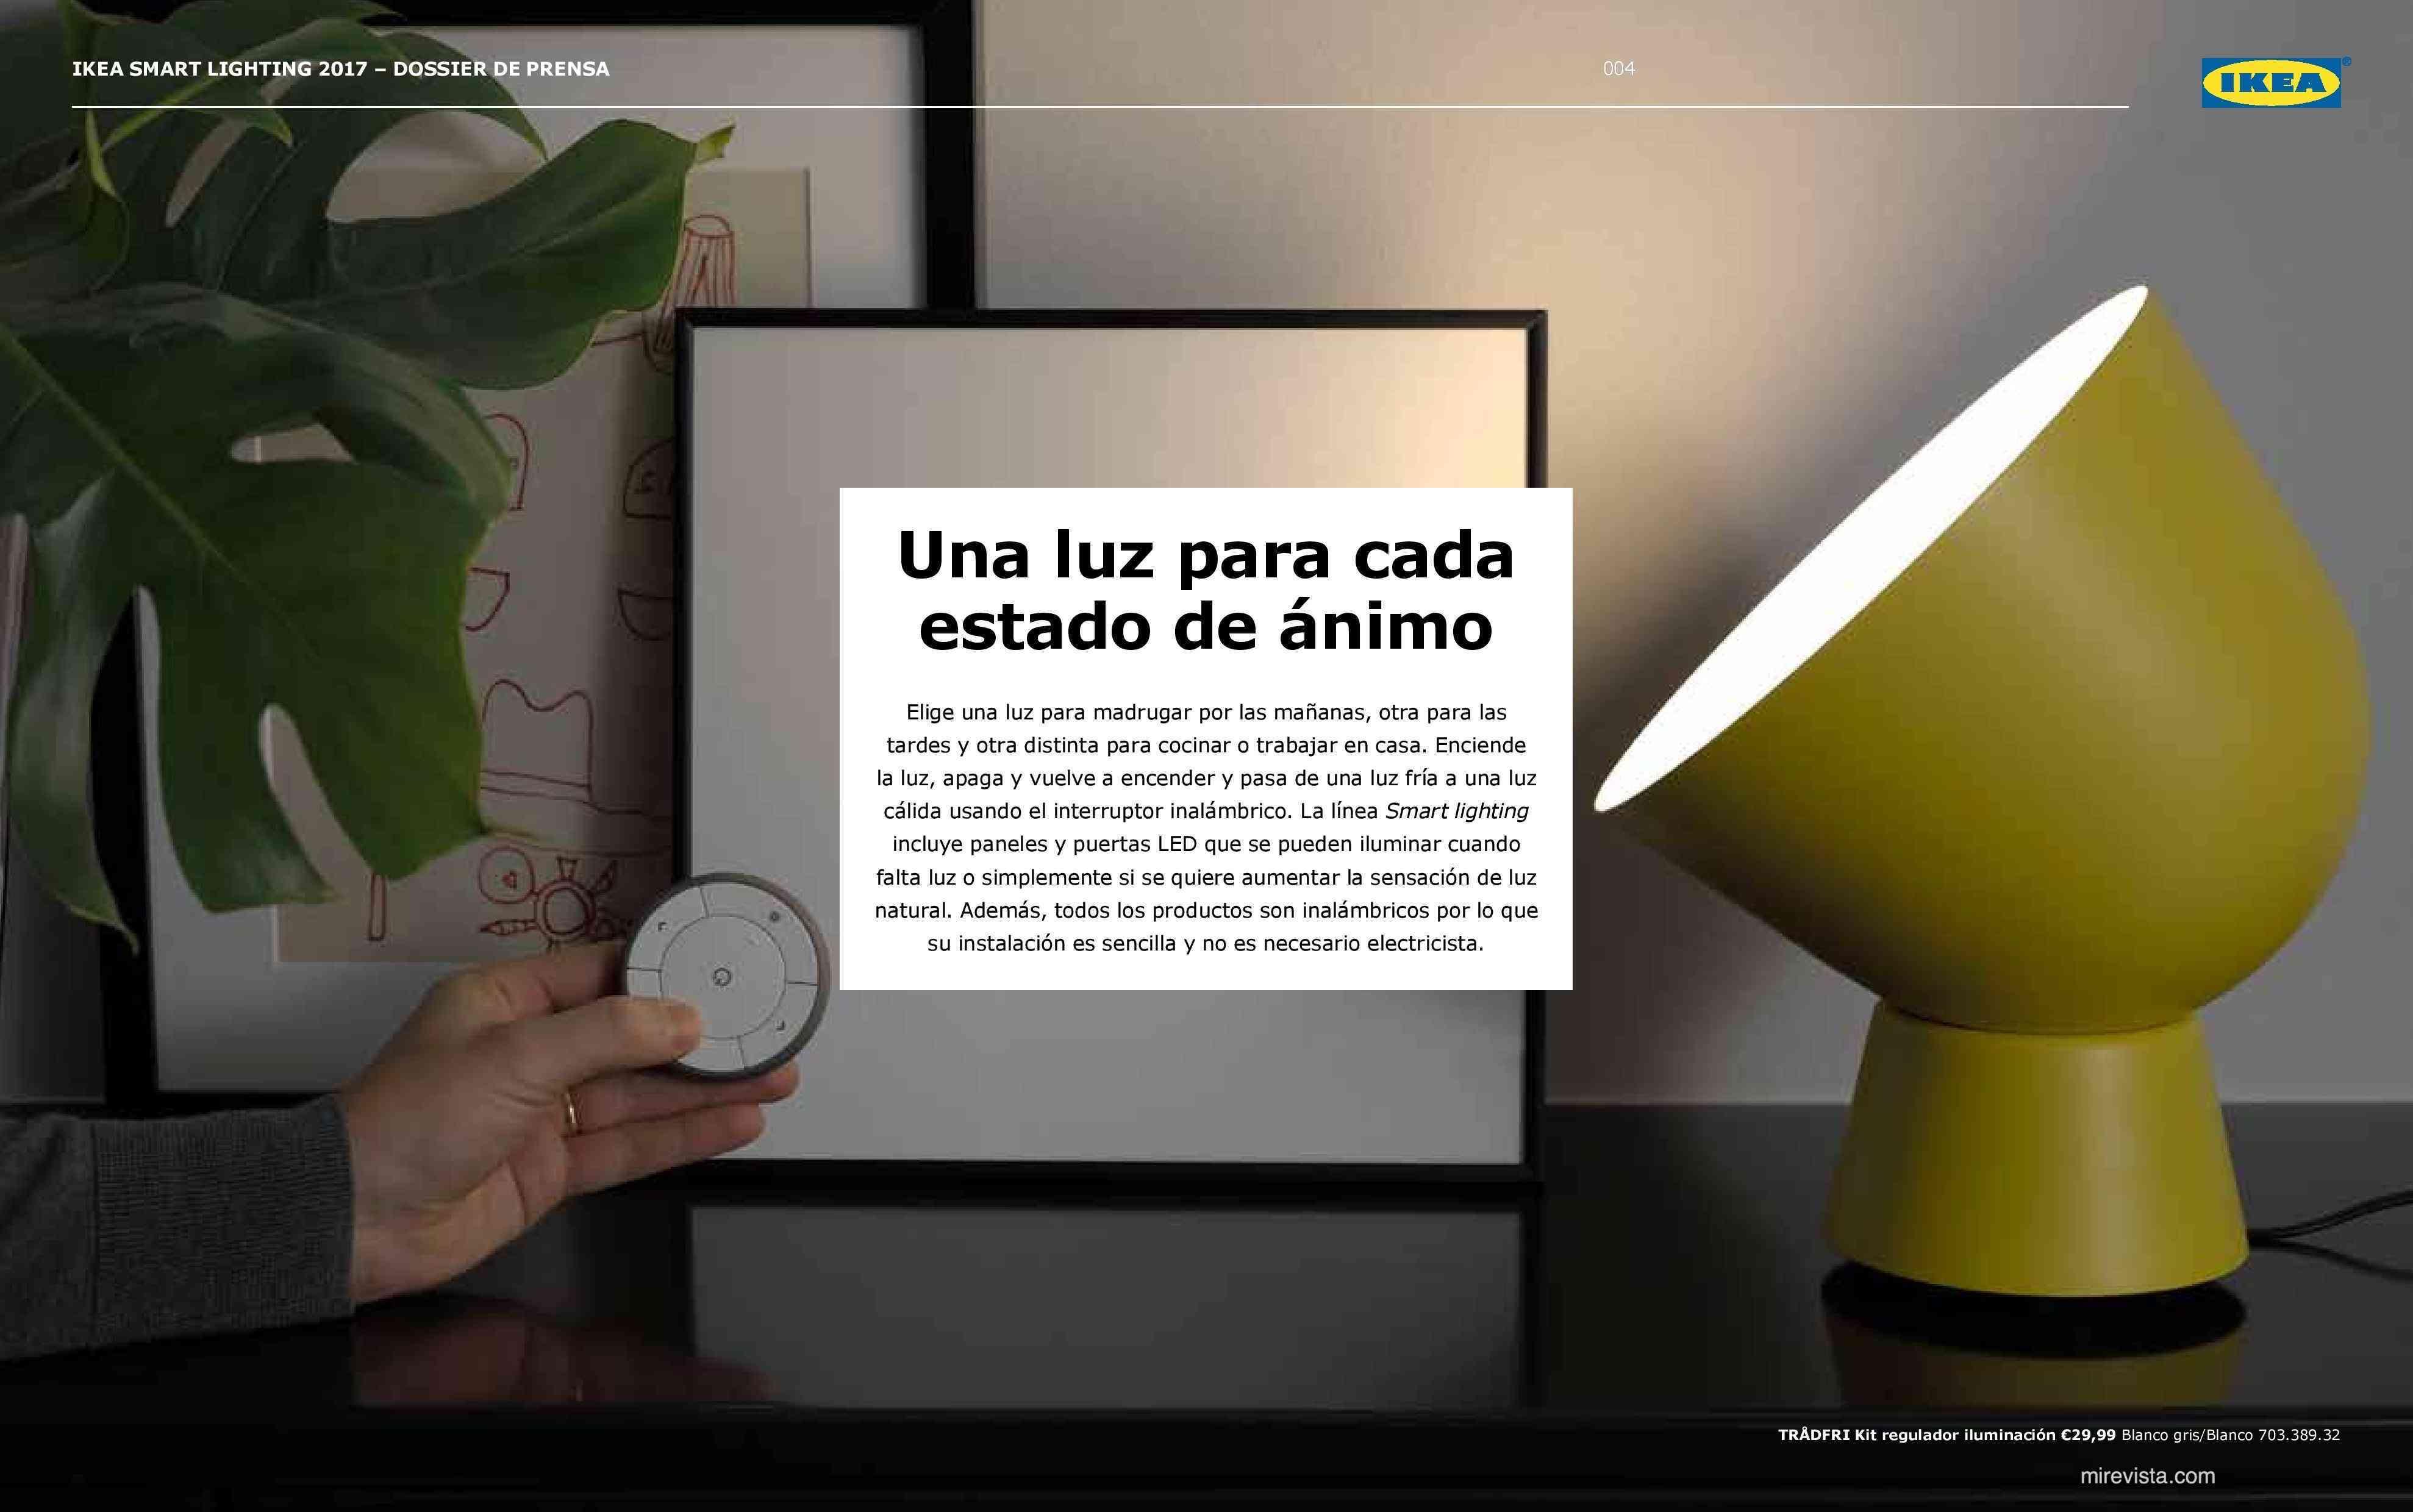 Novedades en iluminación de casas inteligentes con IKEA 60